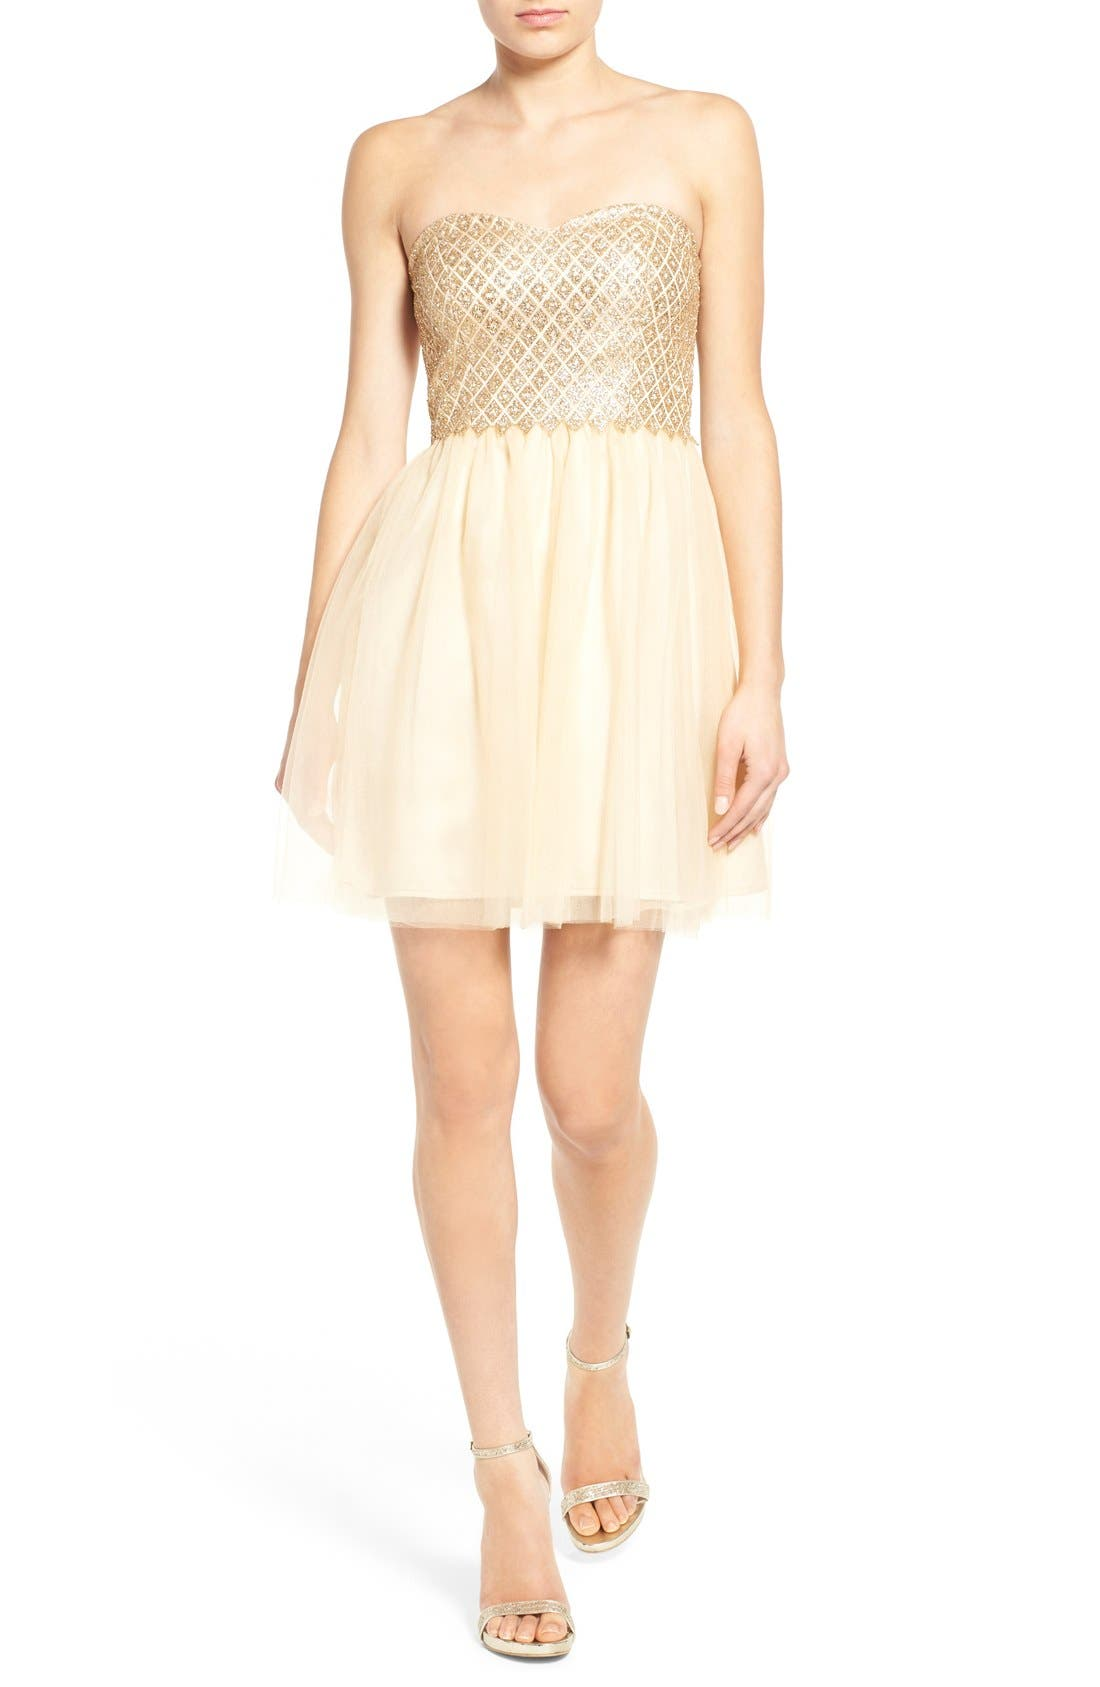 Main Image - a. drea Strapless Glitter Bodice Fit & Flare Dress